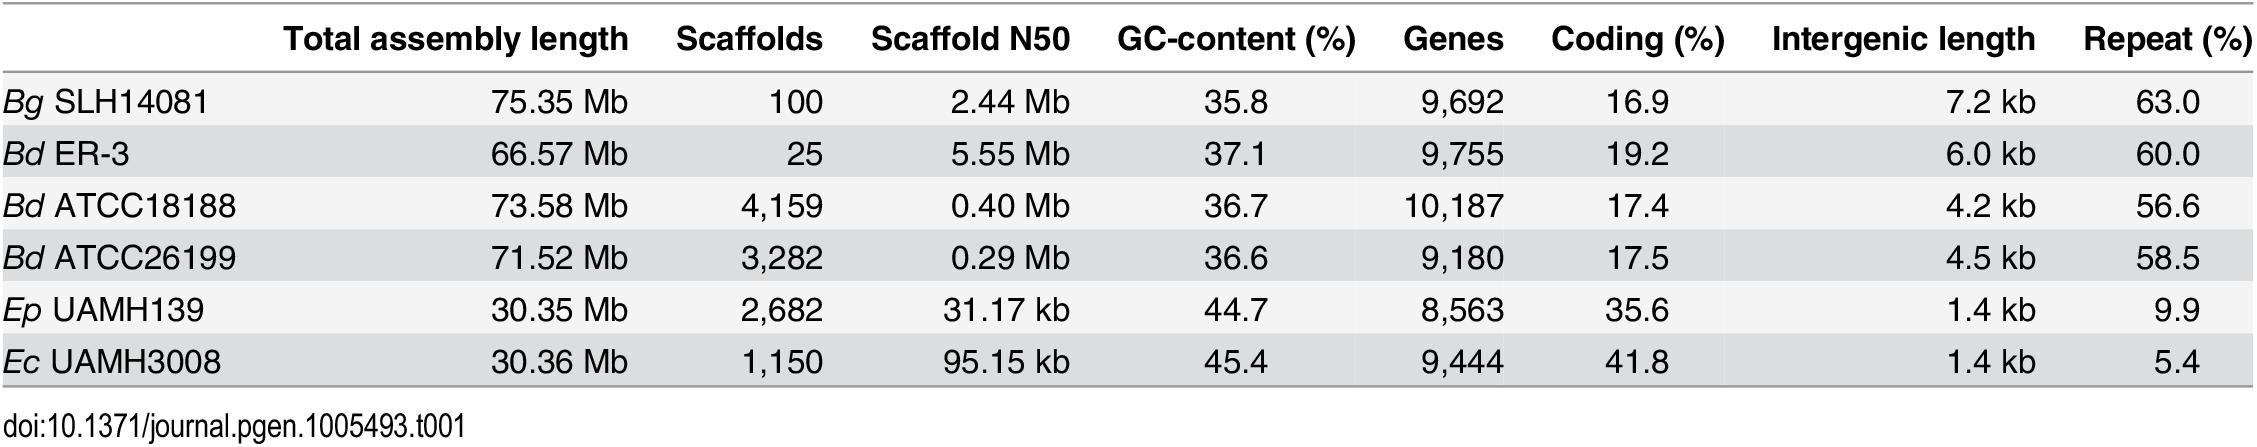 Assembly and annotation statistics for <i>Blastomyces</i> and <i>Emmonsia</i> genomes.